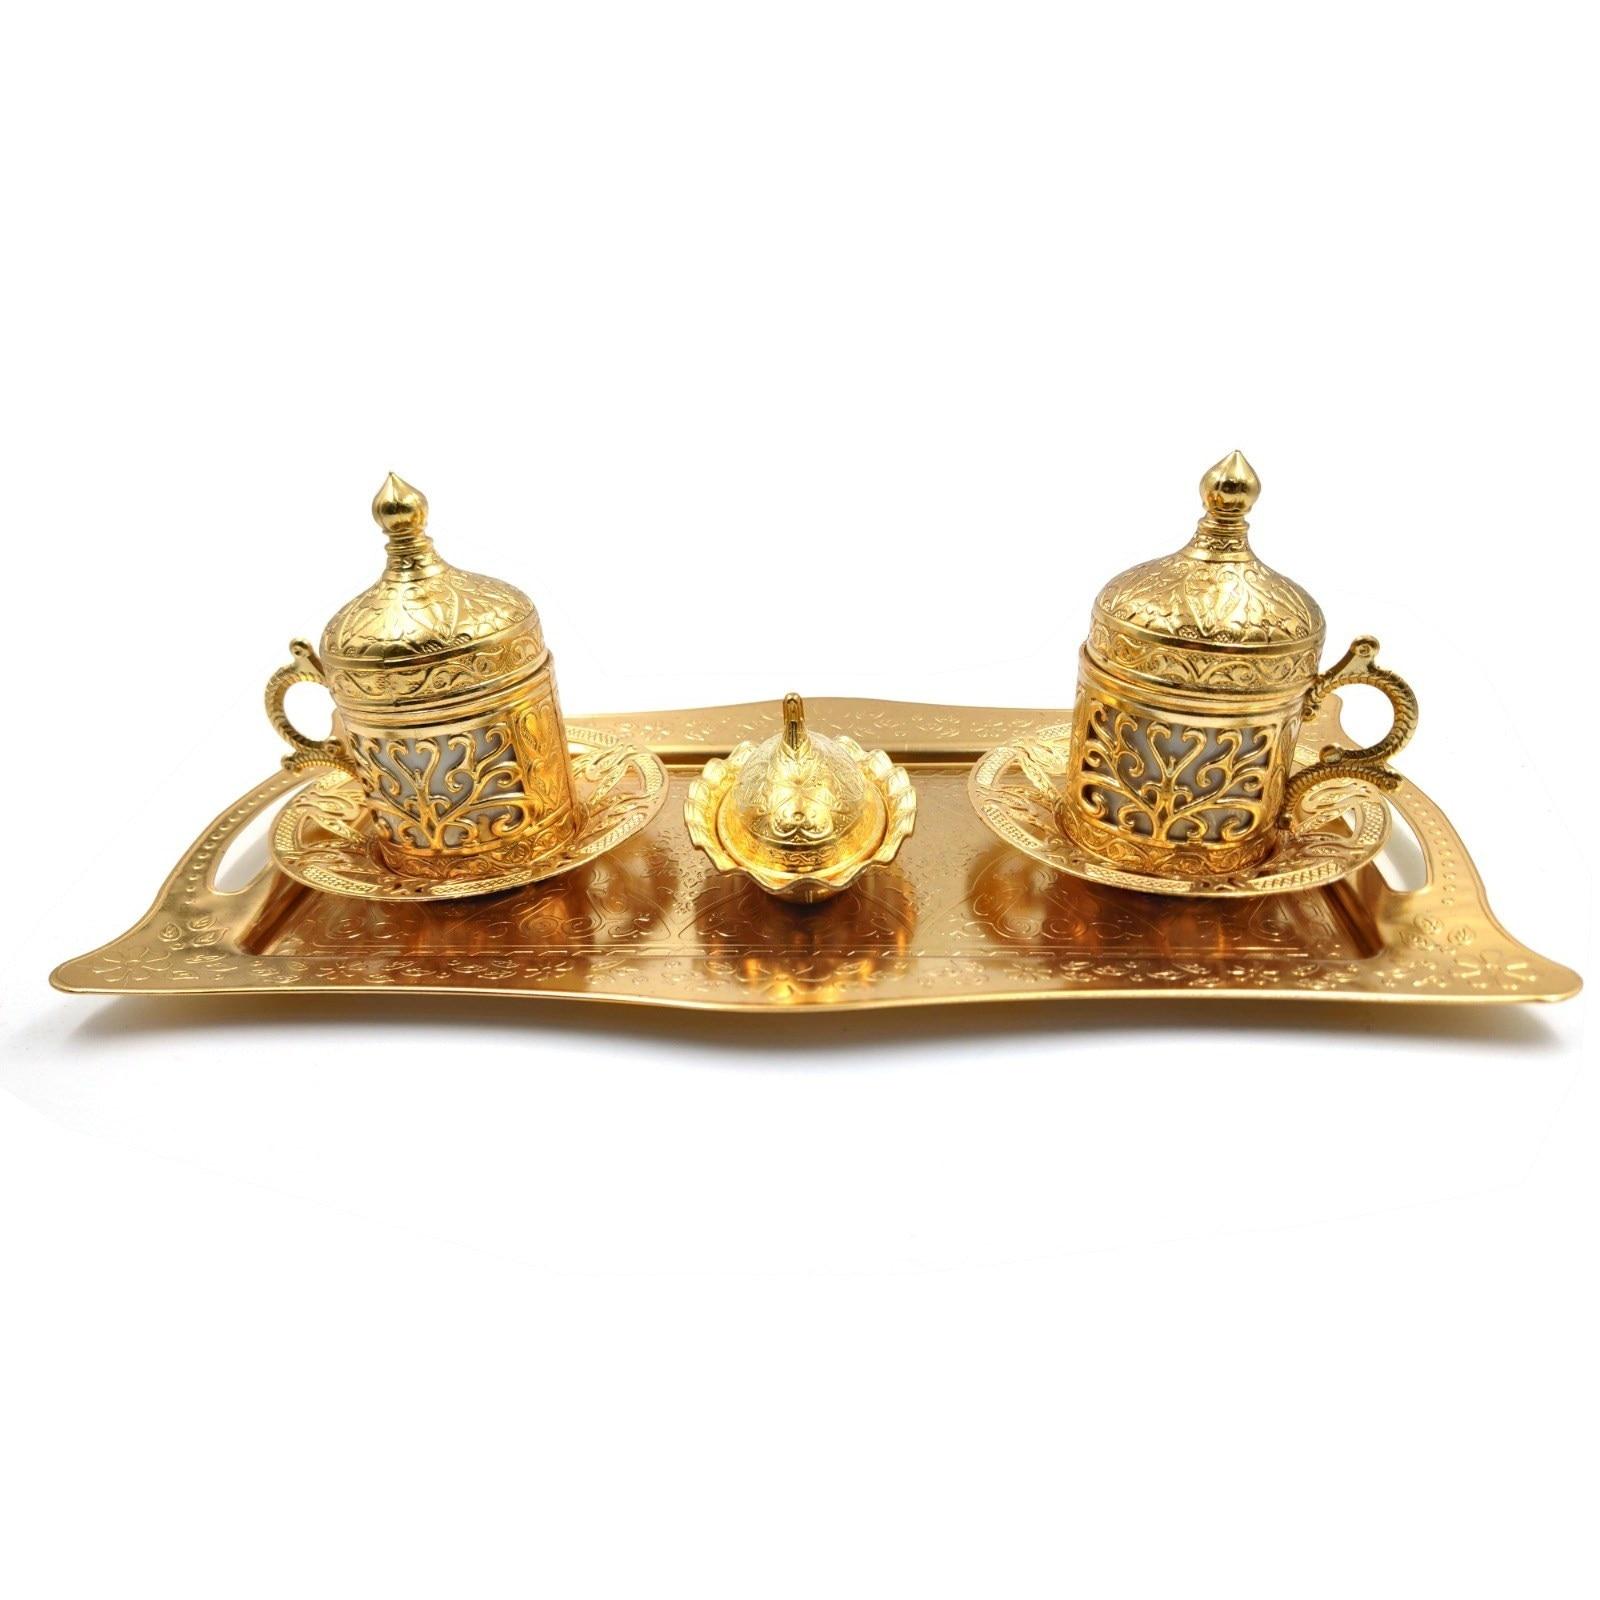 Handmade Clover Design Turkish Greek Arabic Coffee Espresso Serving Set for 2,Cups Saucers Lids Tray Delight Sugar Dish